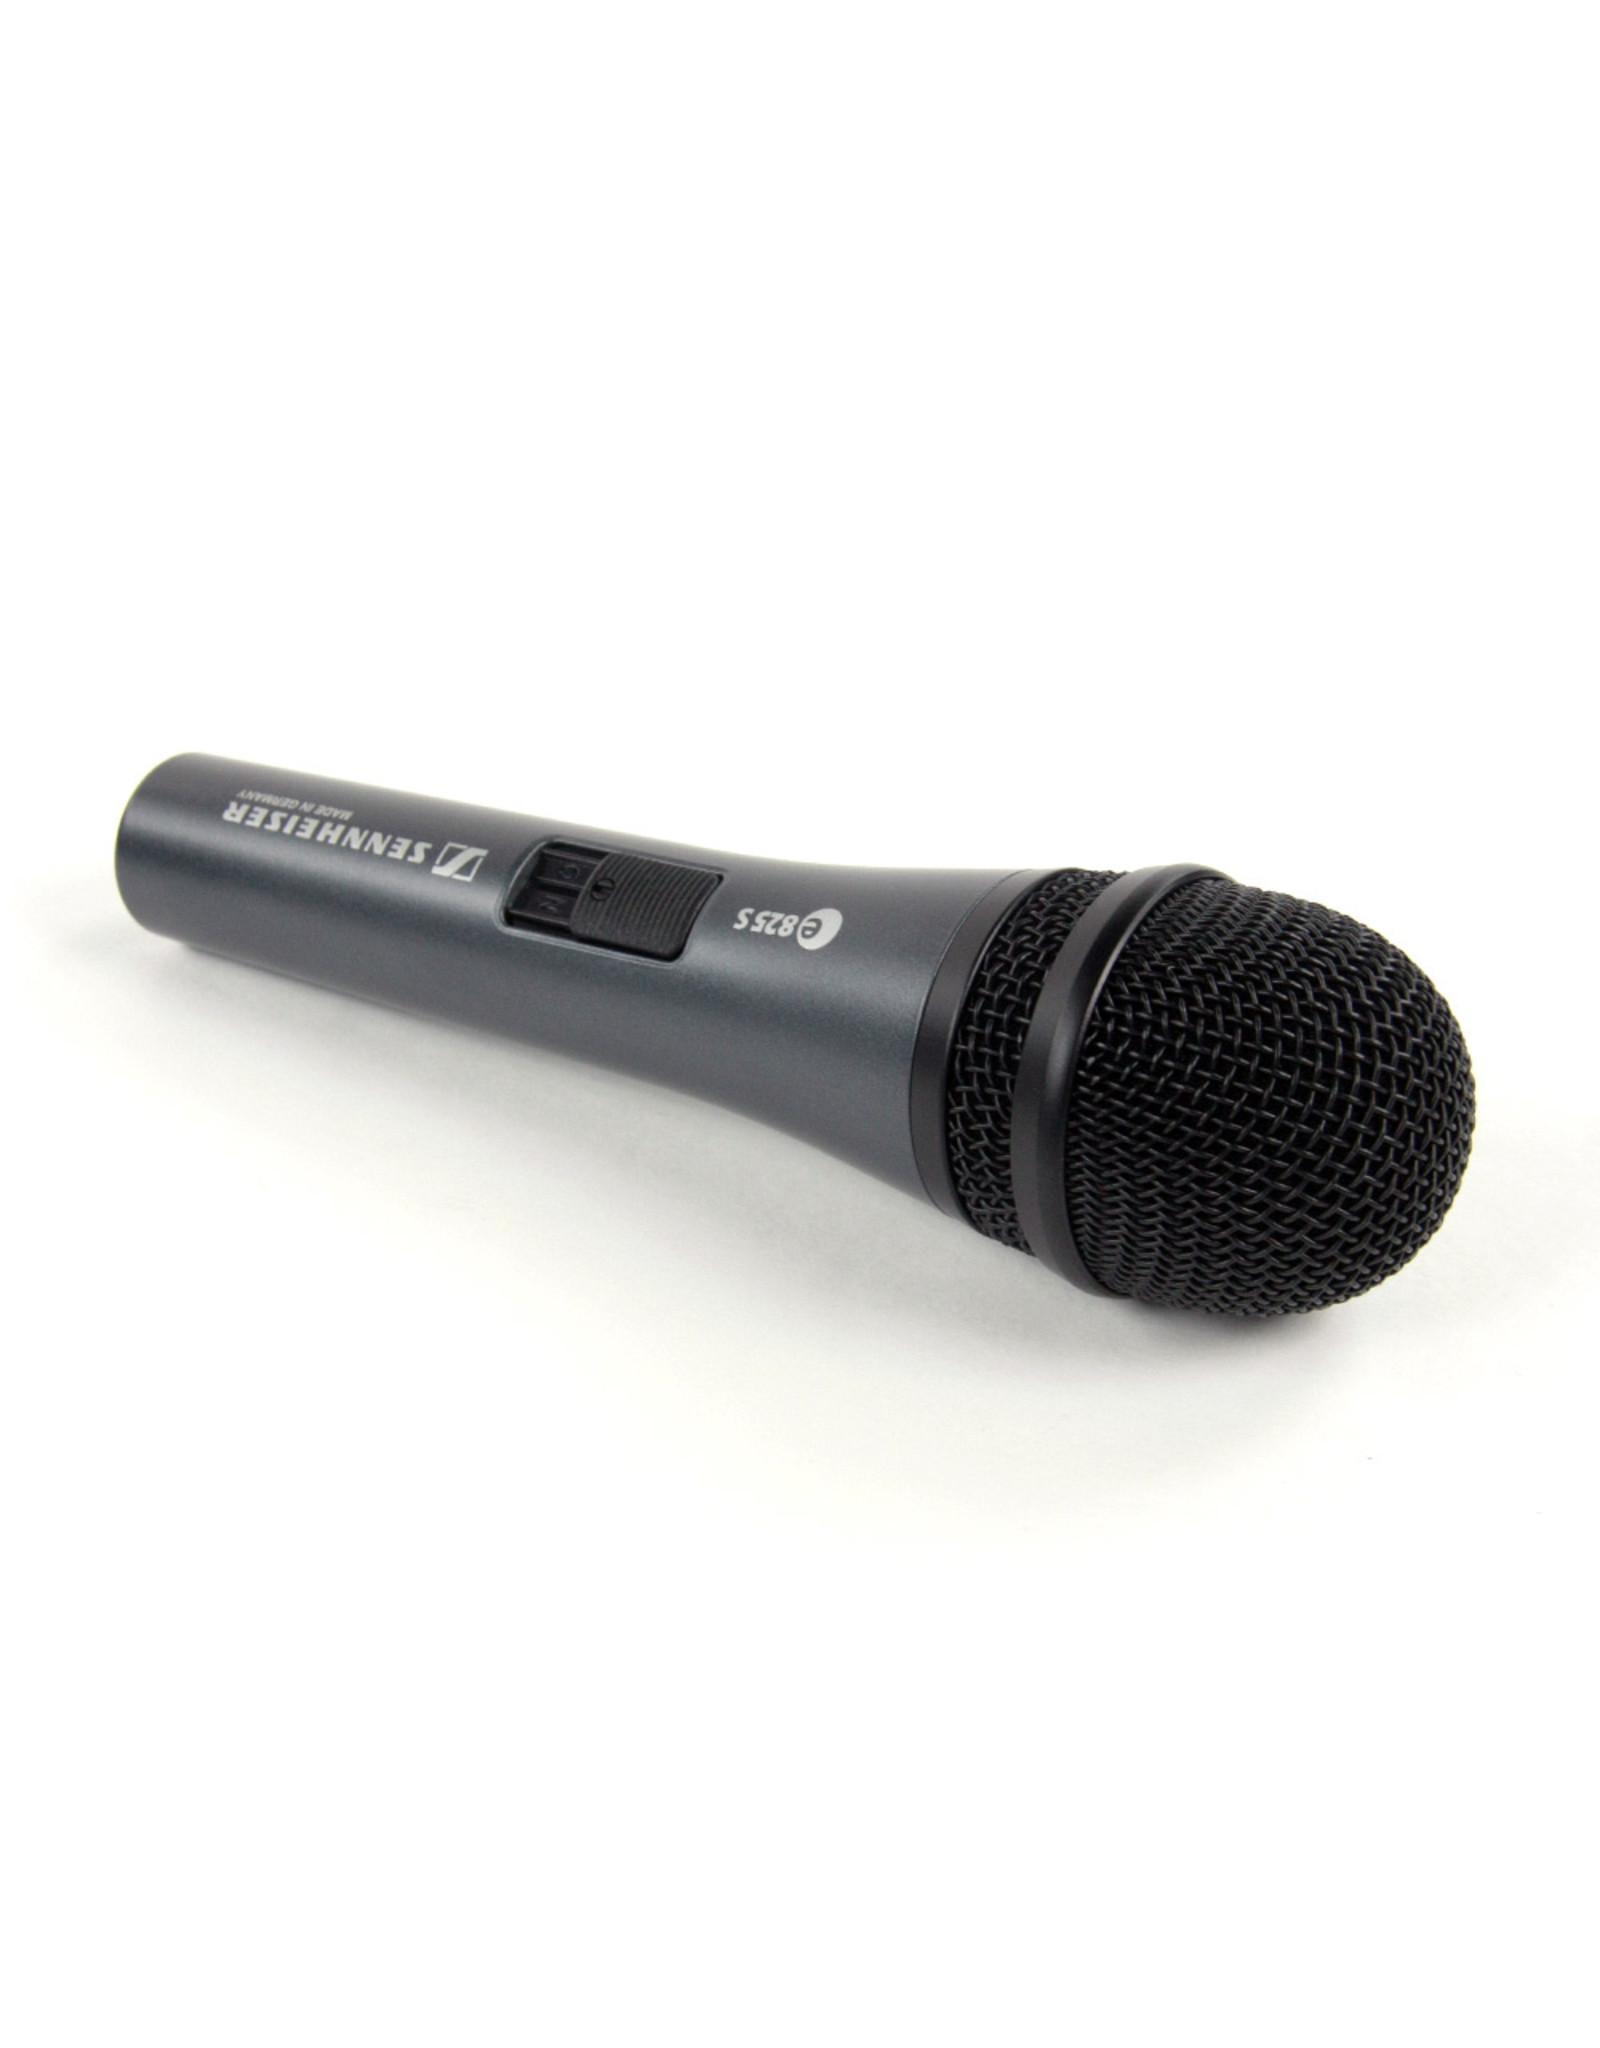 Sennheiser Sennheiser e 825-S dynamische zangmicrofoon